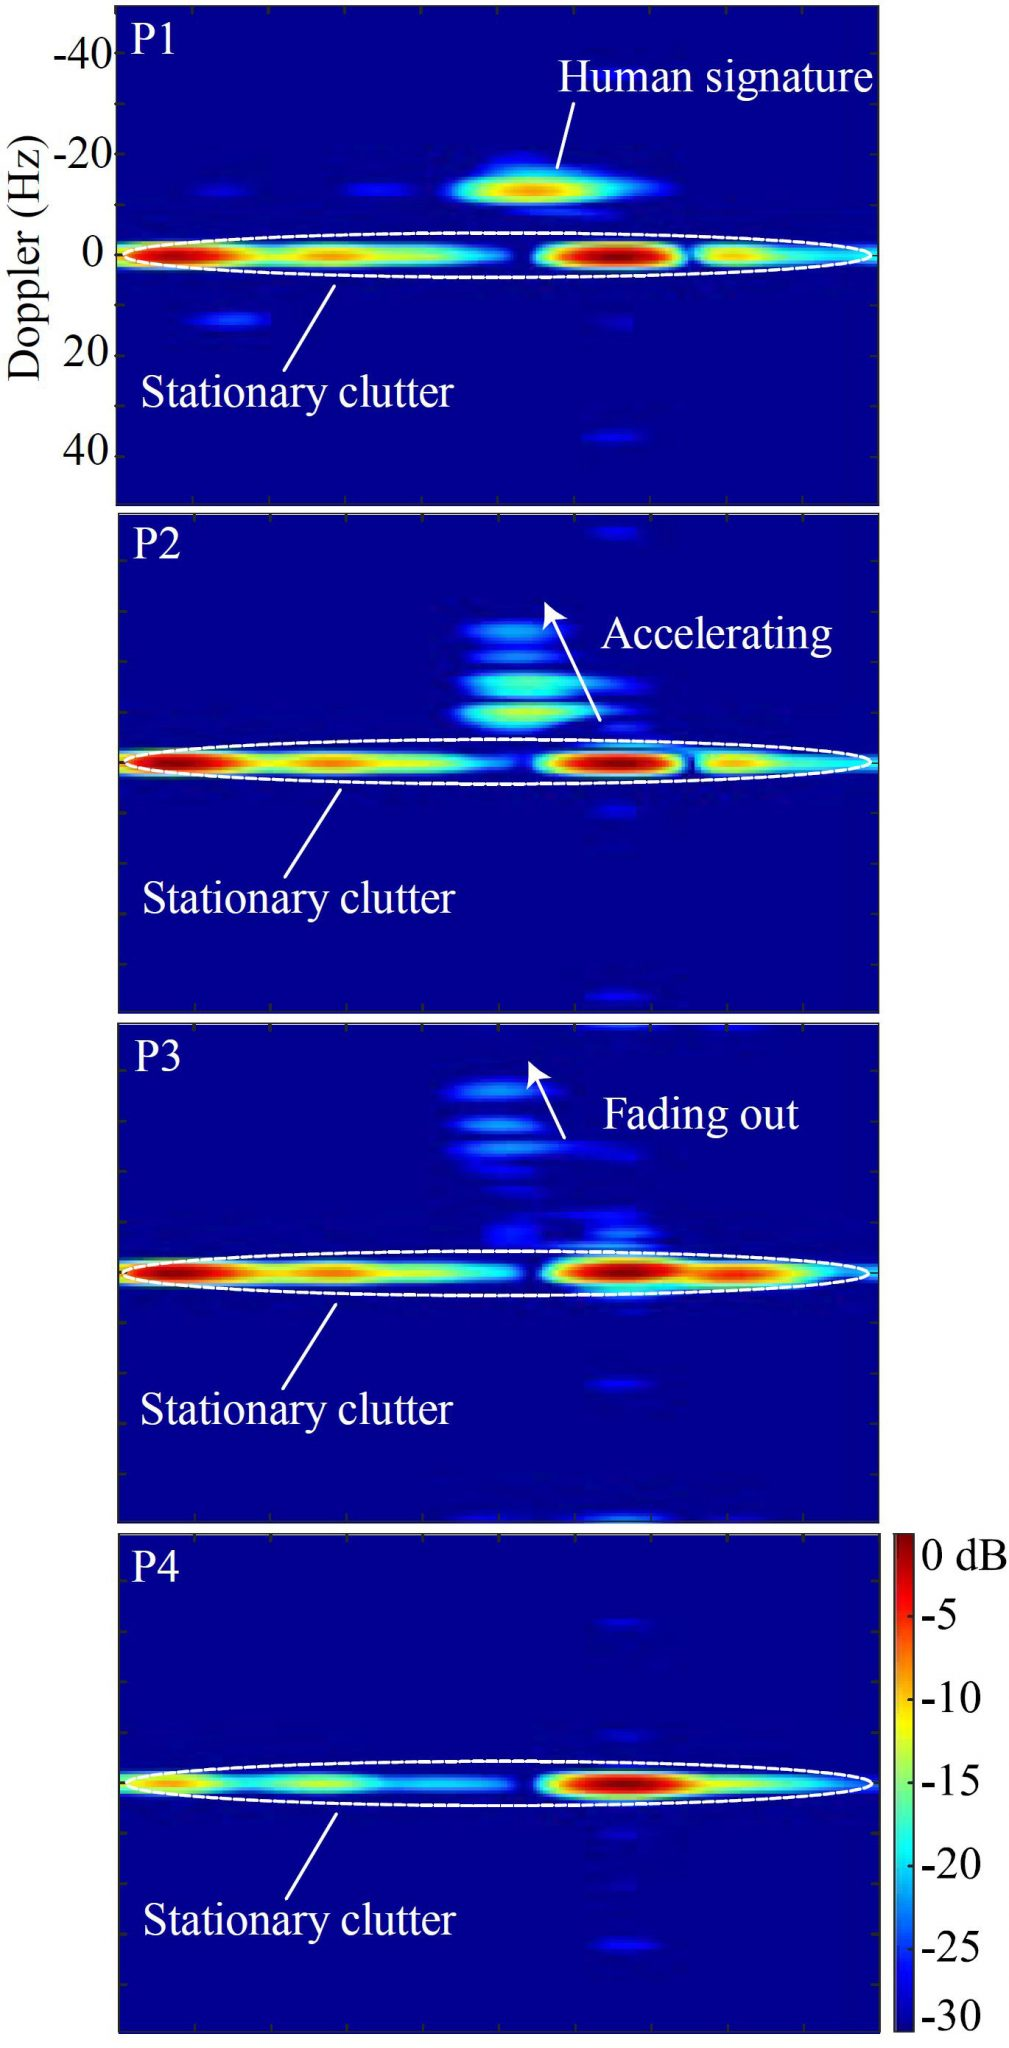 Fig. 12. Corresponding range-Doppler images of a fall incident